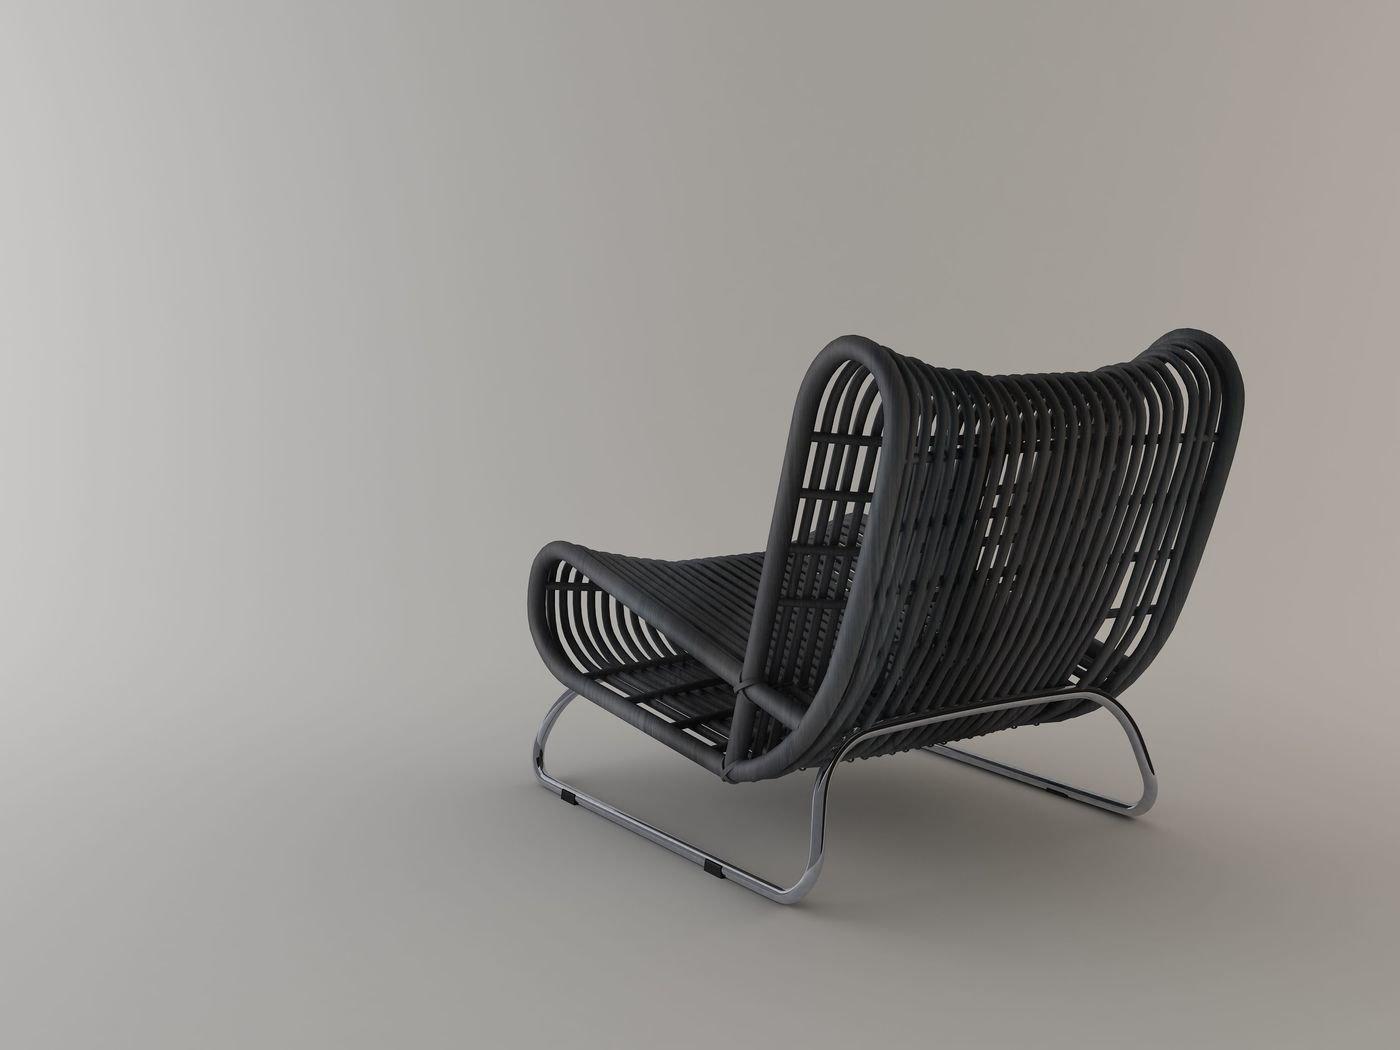 Astonishing Loop Lounge Chair By Abie Abdillah At Coroflot Com Customarchery Wood Chair Design Ideas Customarcherynet